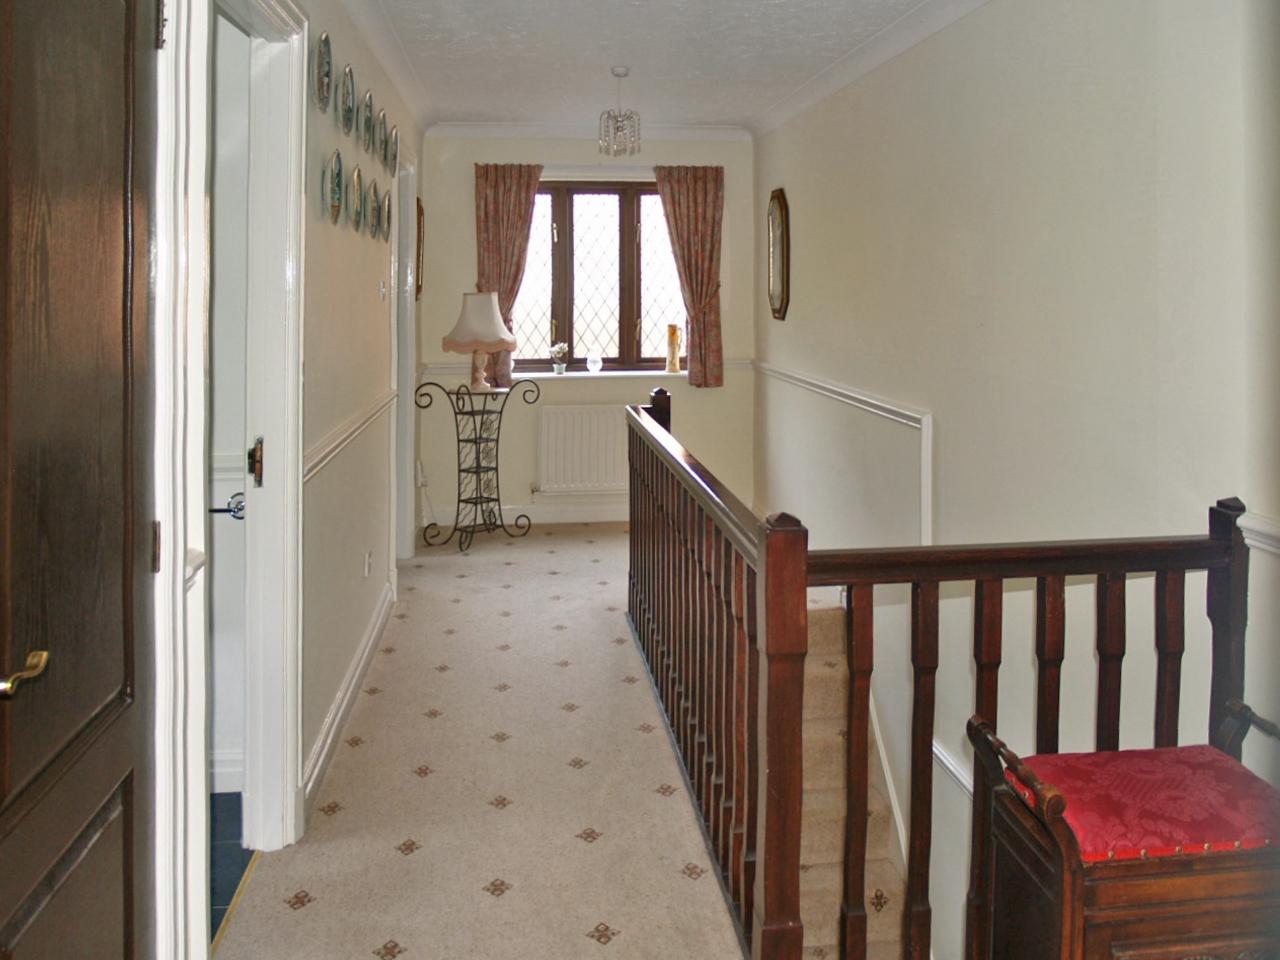 4 bedroom detached house SSTC in Birmingham - photograph 10.